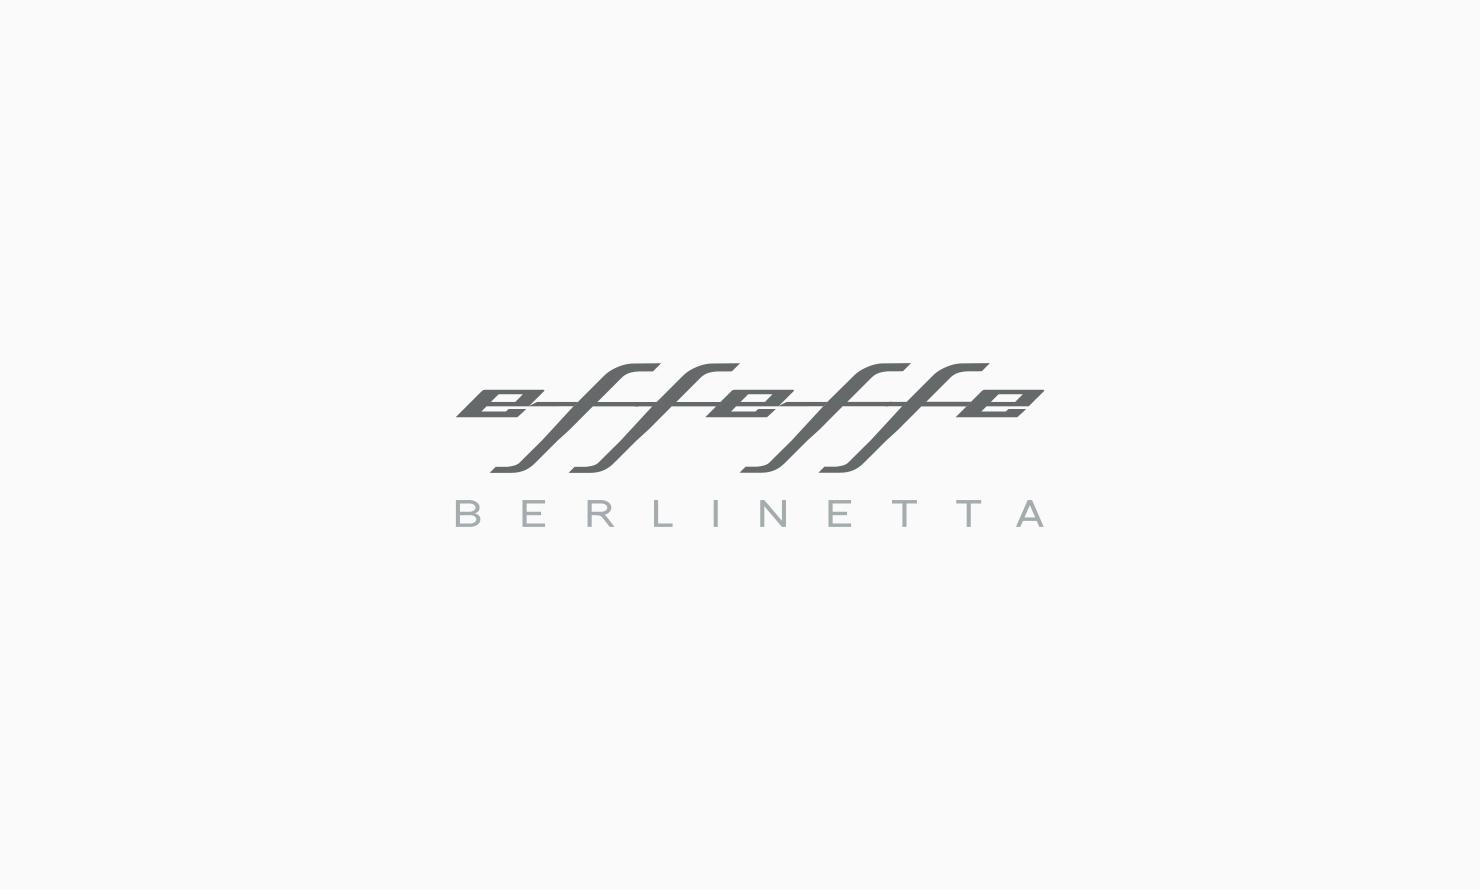 https://kubelibre.com/uploads/Slider-work-tutti-clienti/fratelli-frigerio-effeffe-berlinetta-un-auto-d-altri-tempi-costruita-oggi-1.jpg